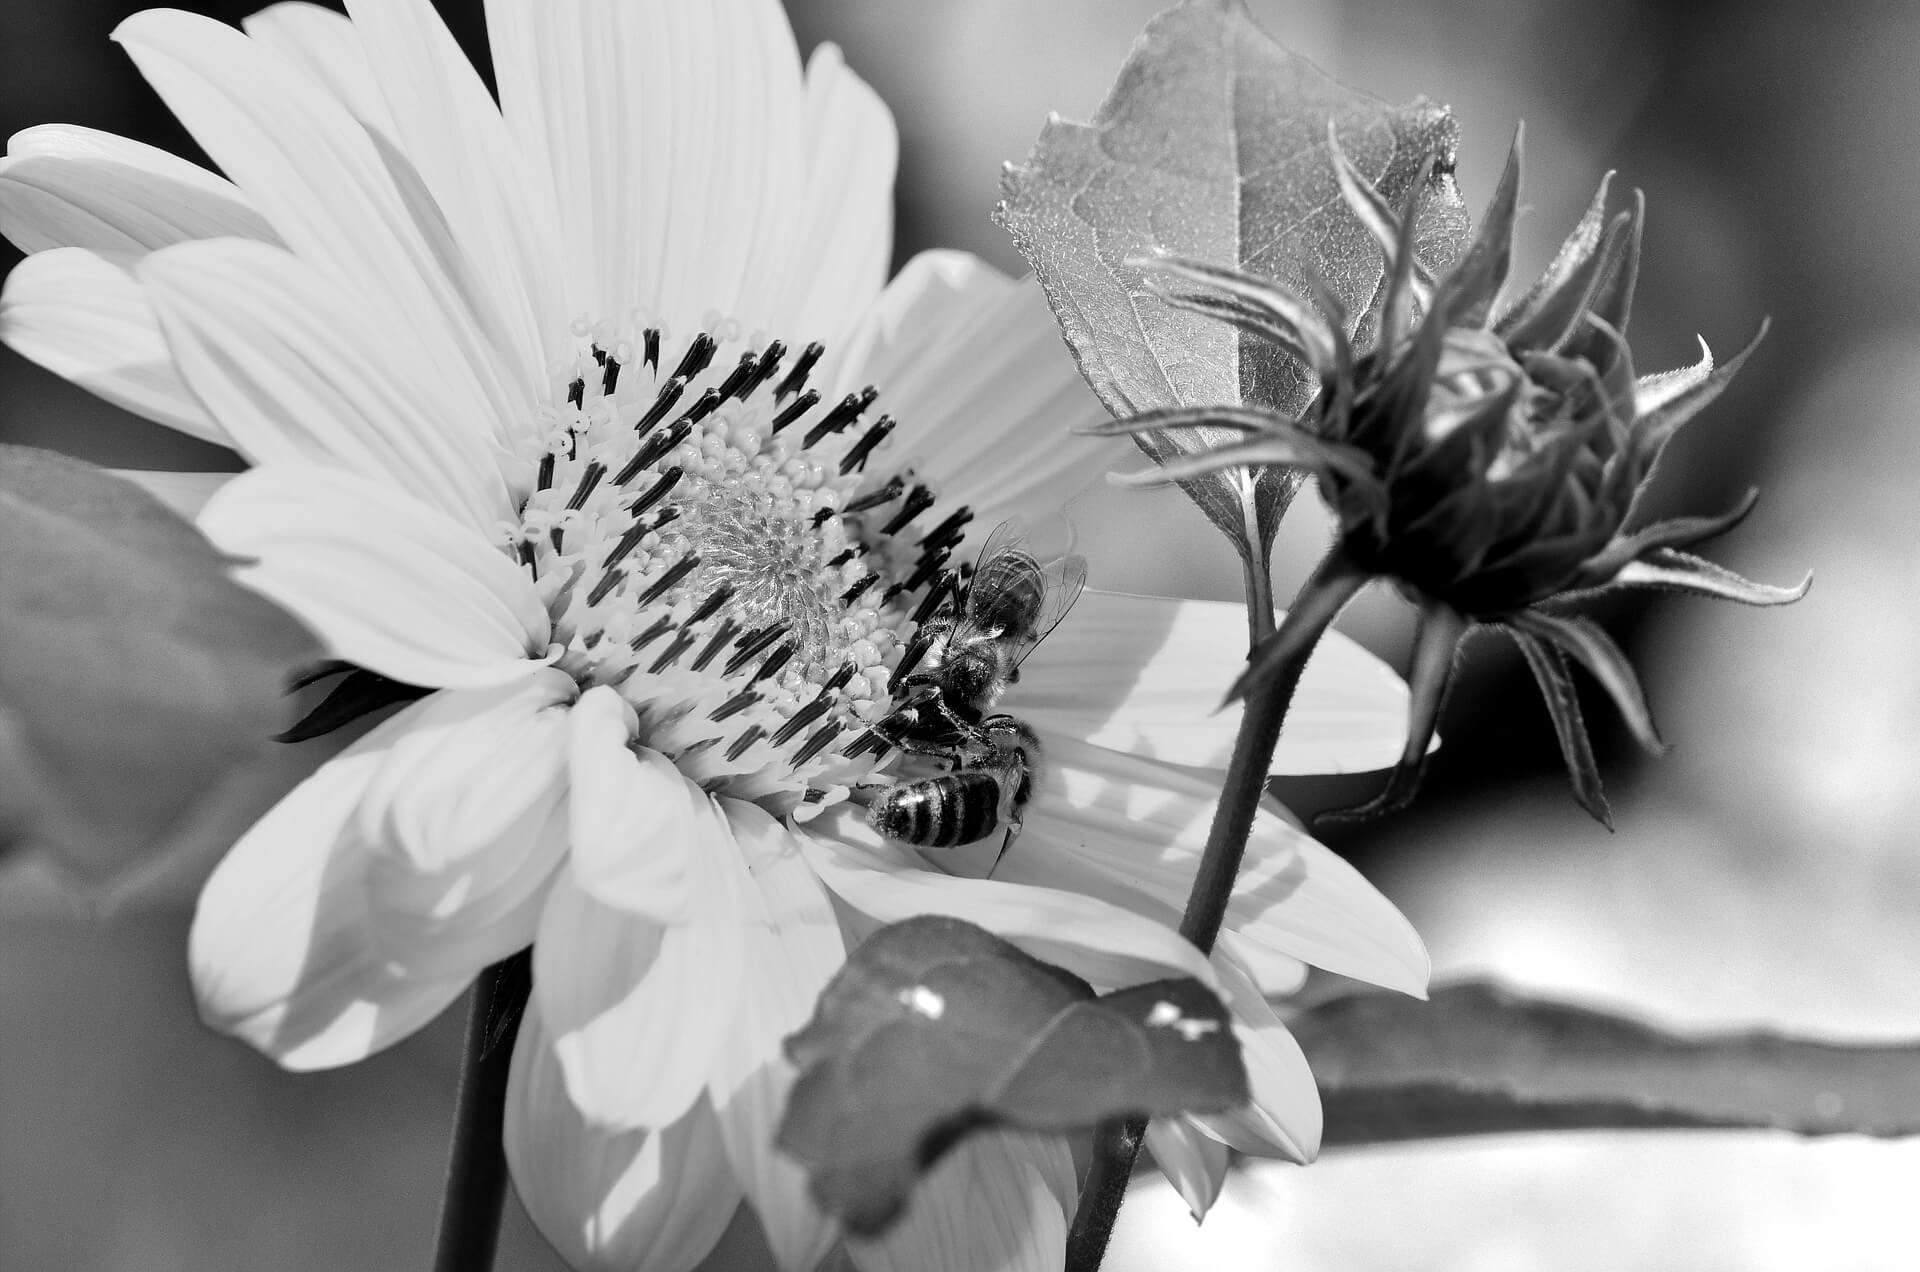 blühpatenschaft-als-trauerritual-bei-fehlgeburten-blog-gedankenbalsam